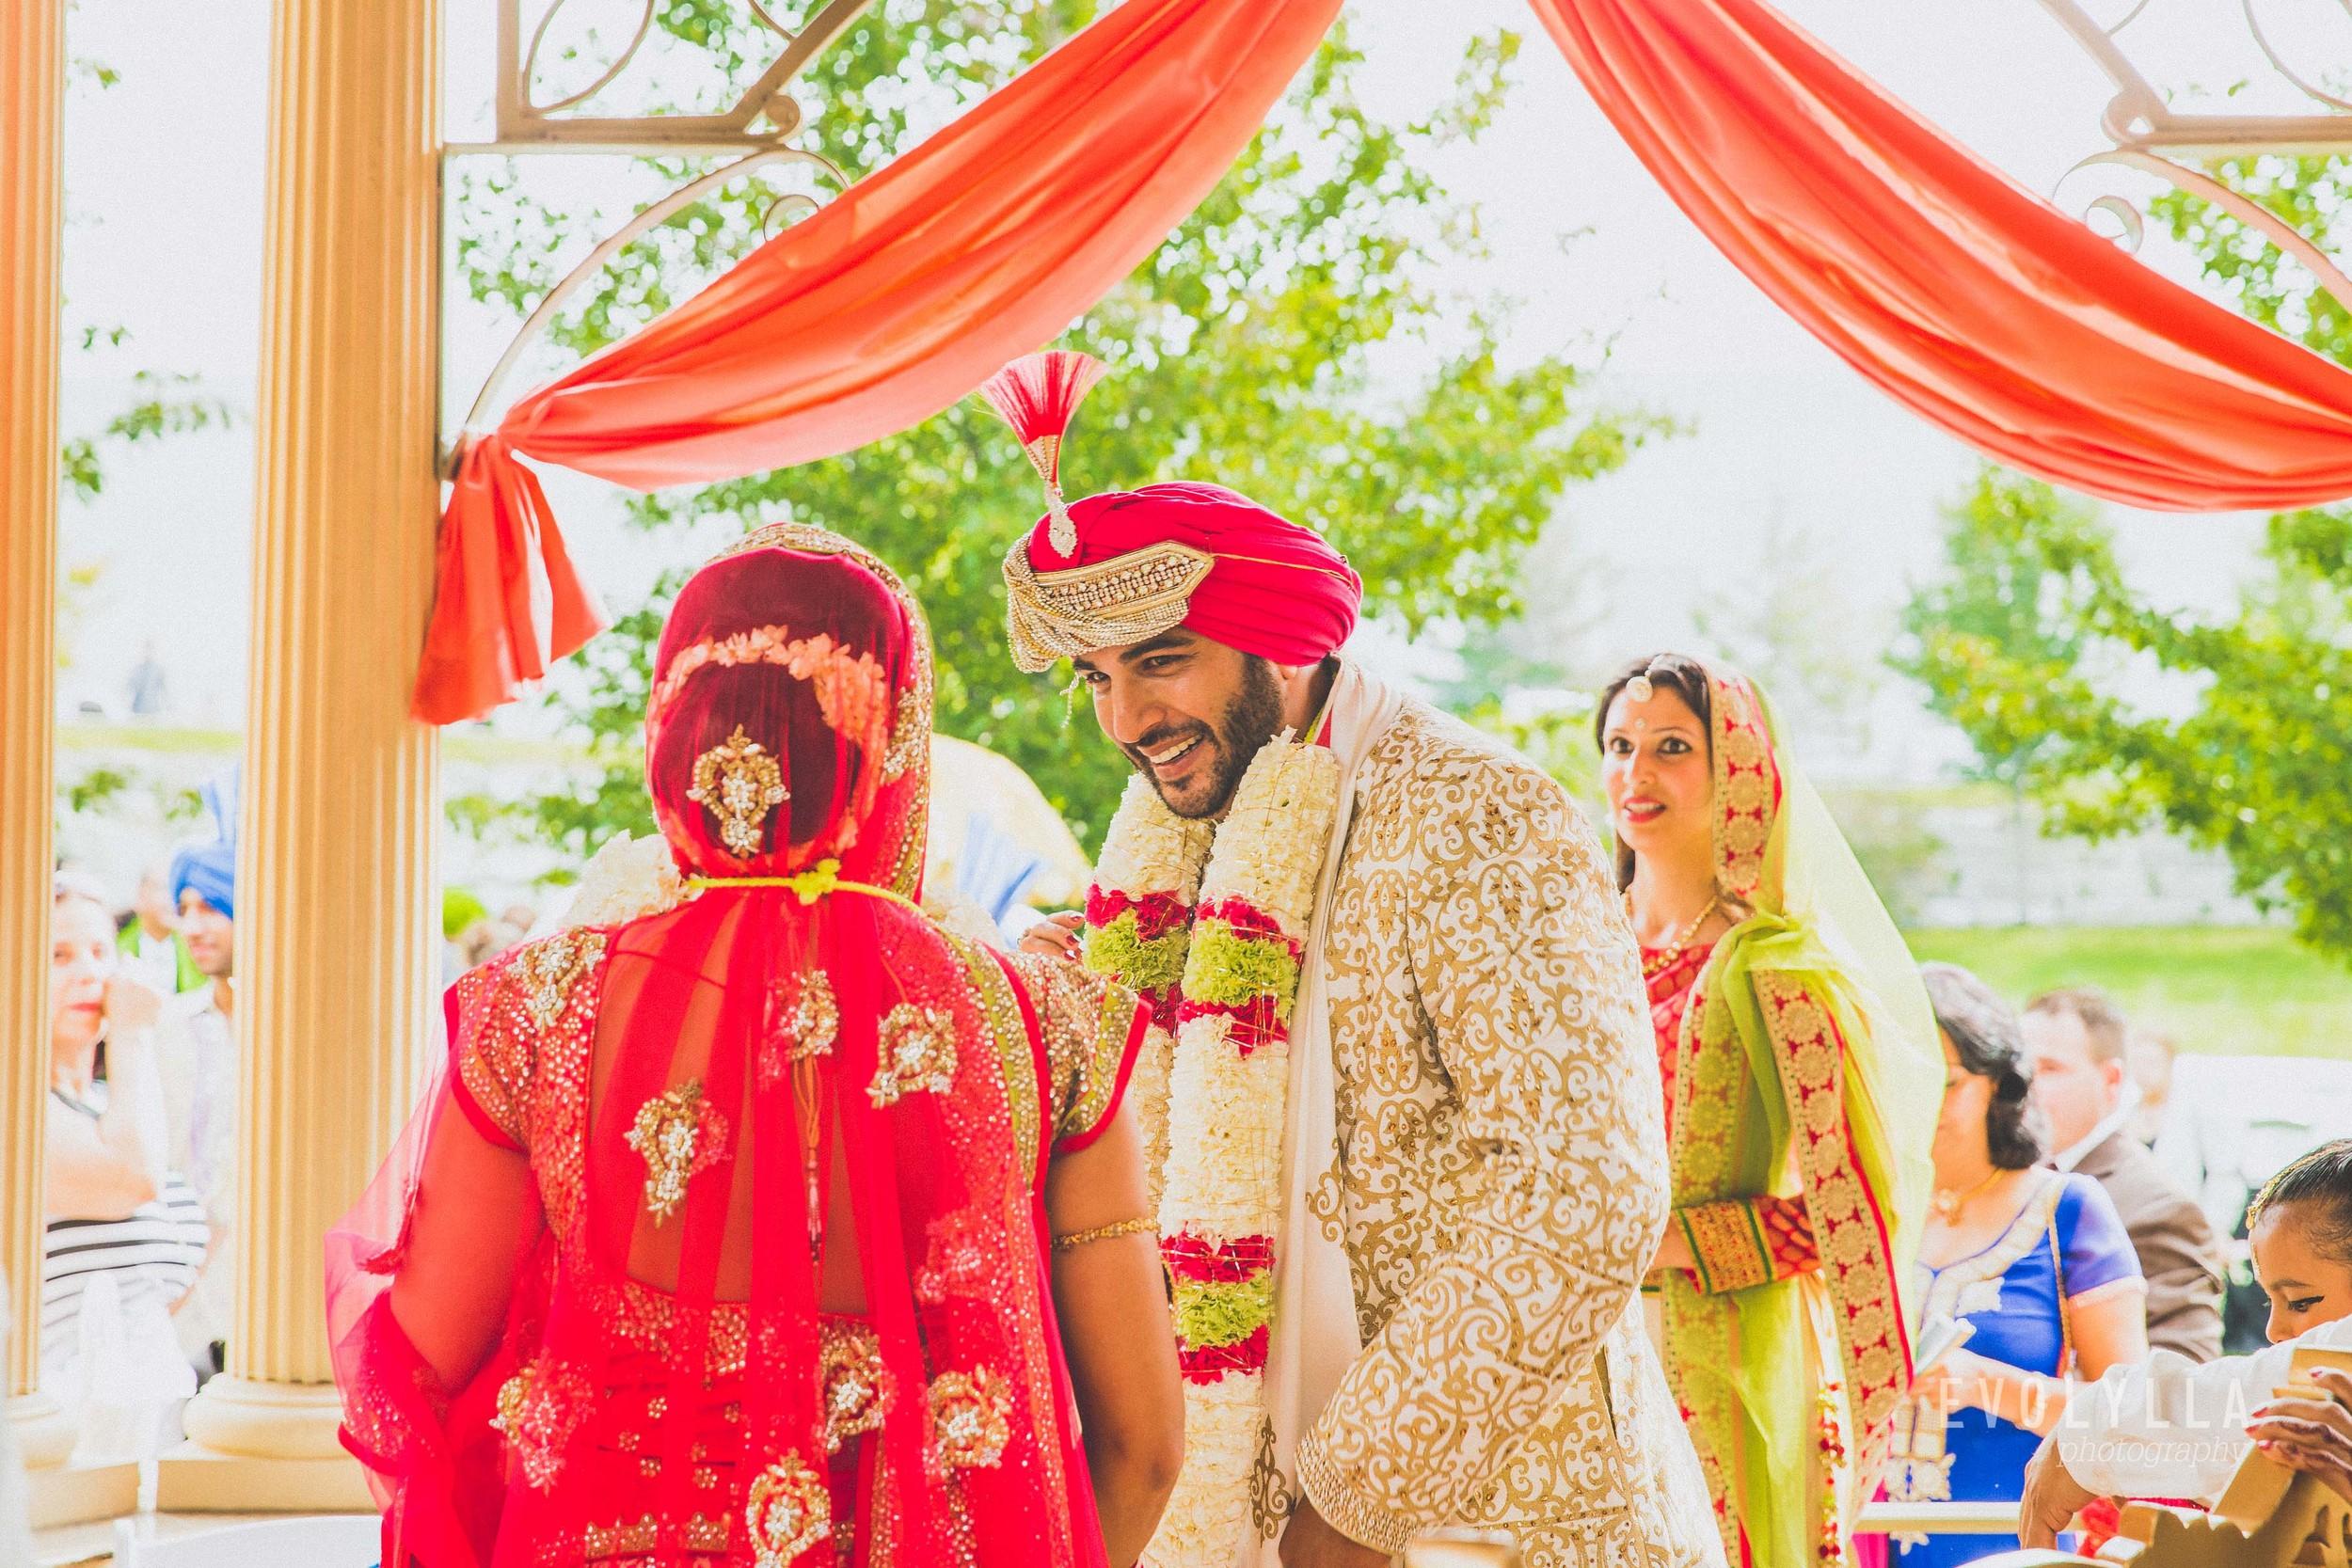 toronto indian wedding customs